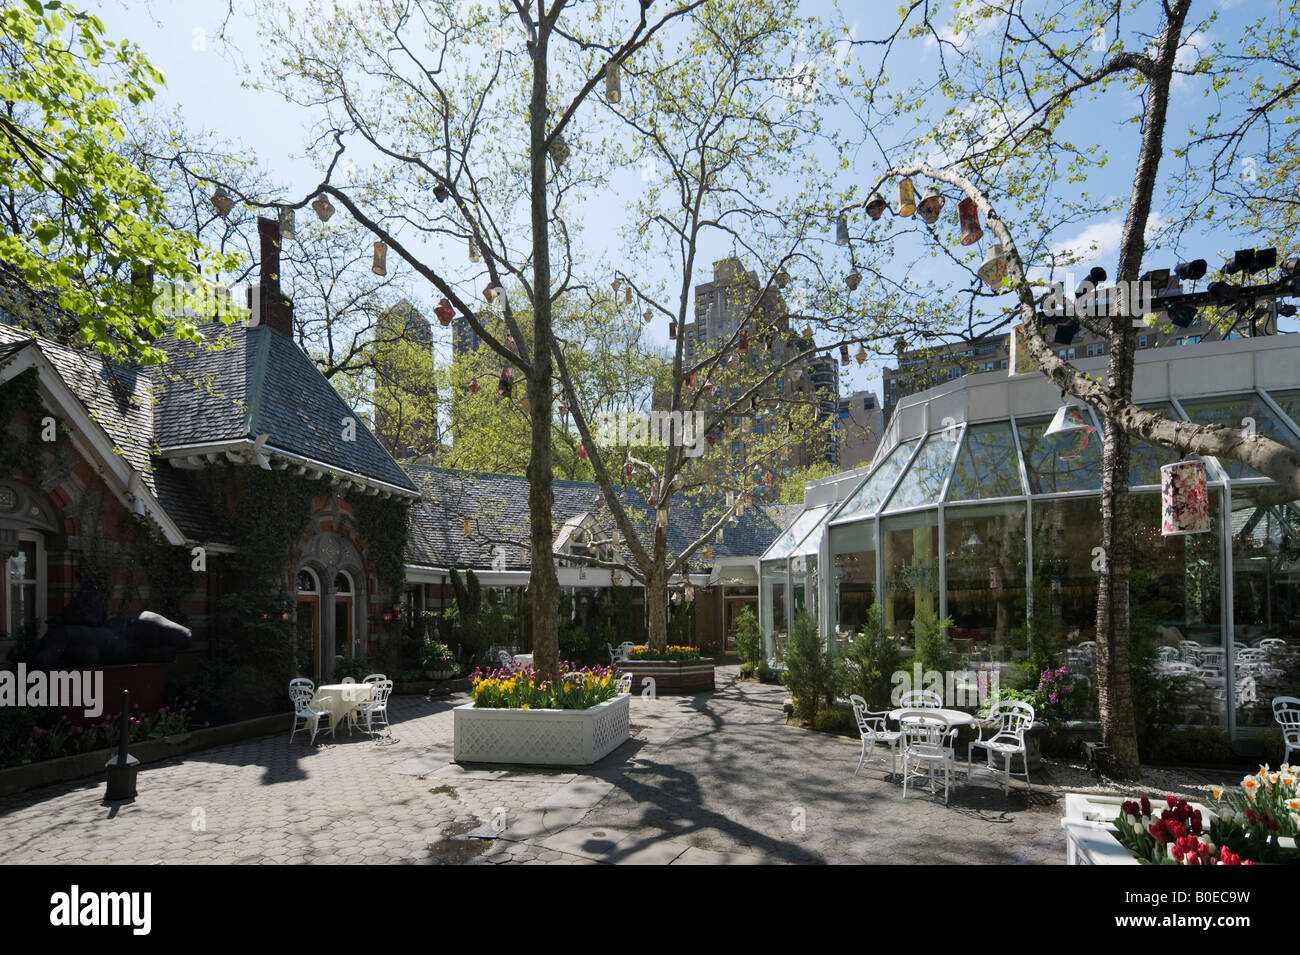 Tavern on the green restaurant central park manhattan for Cuisine on the green